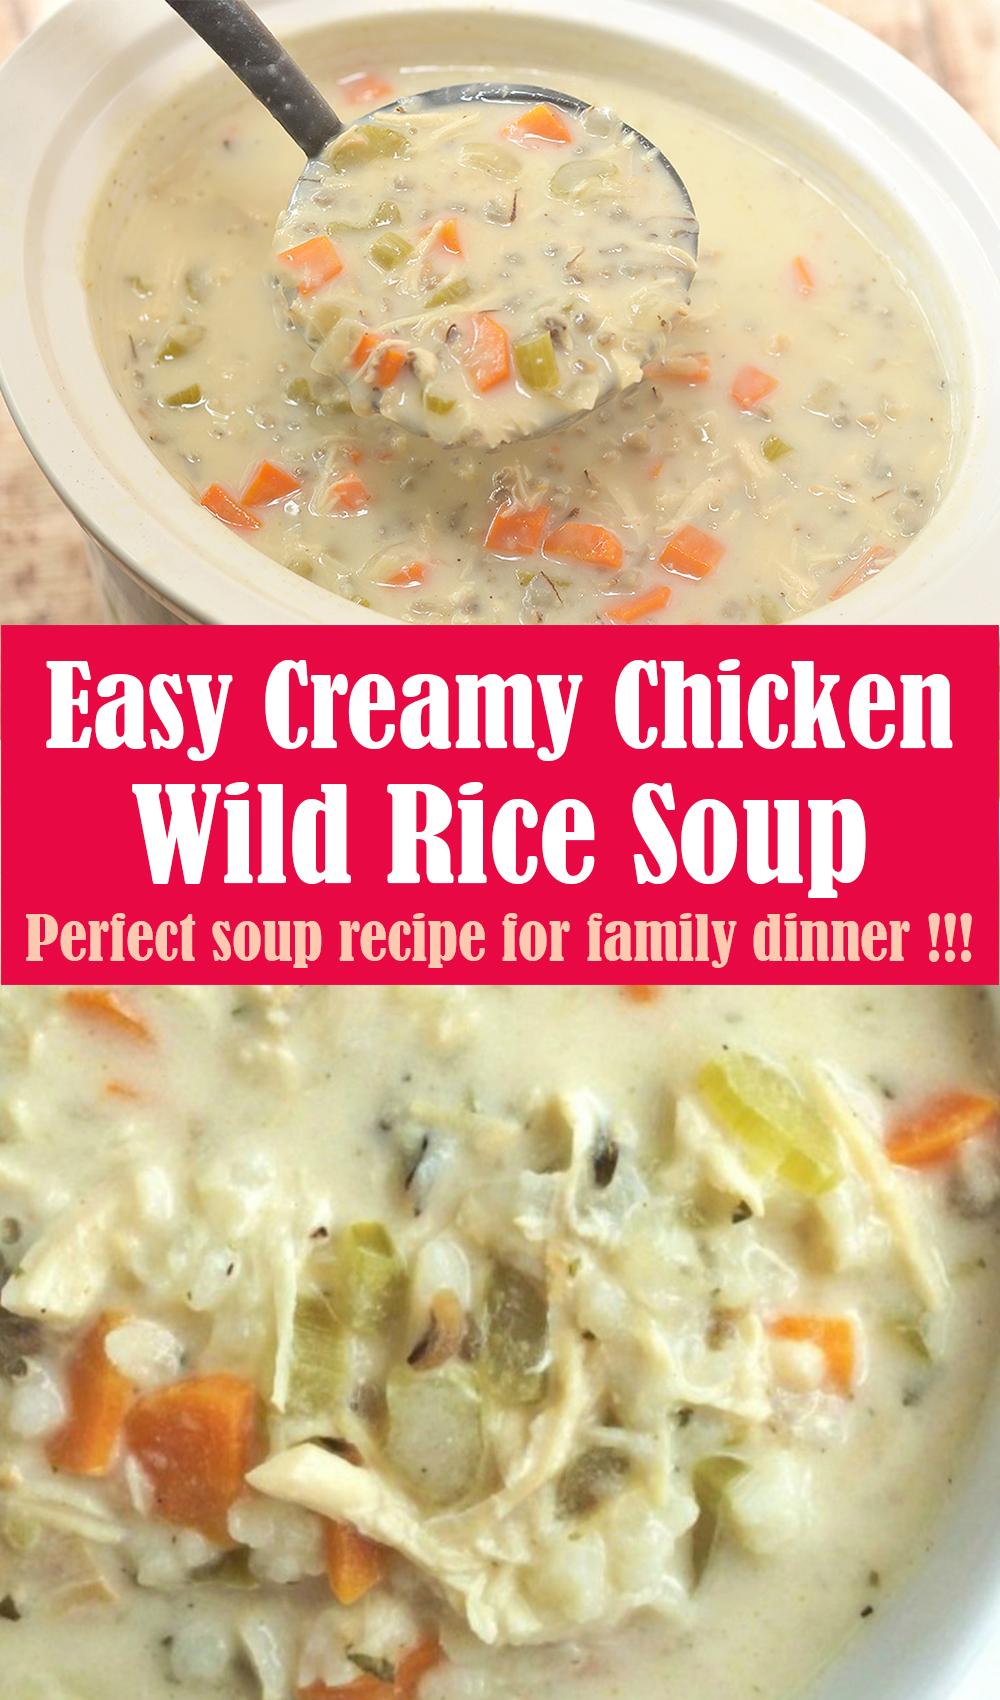 Easy Creamy Chicken Wild Rice Soup